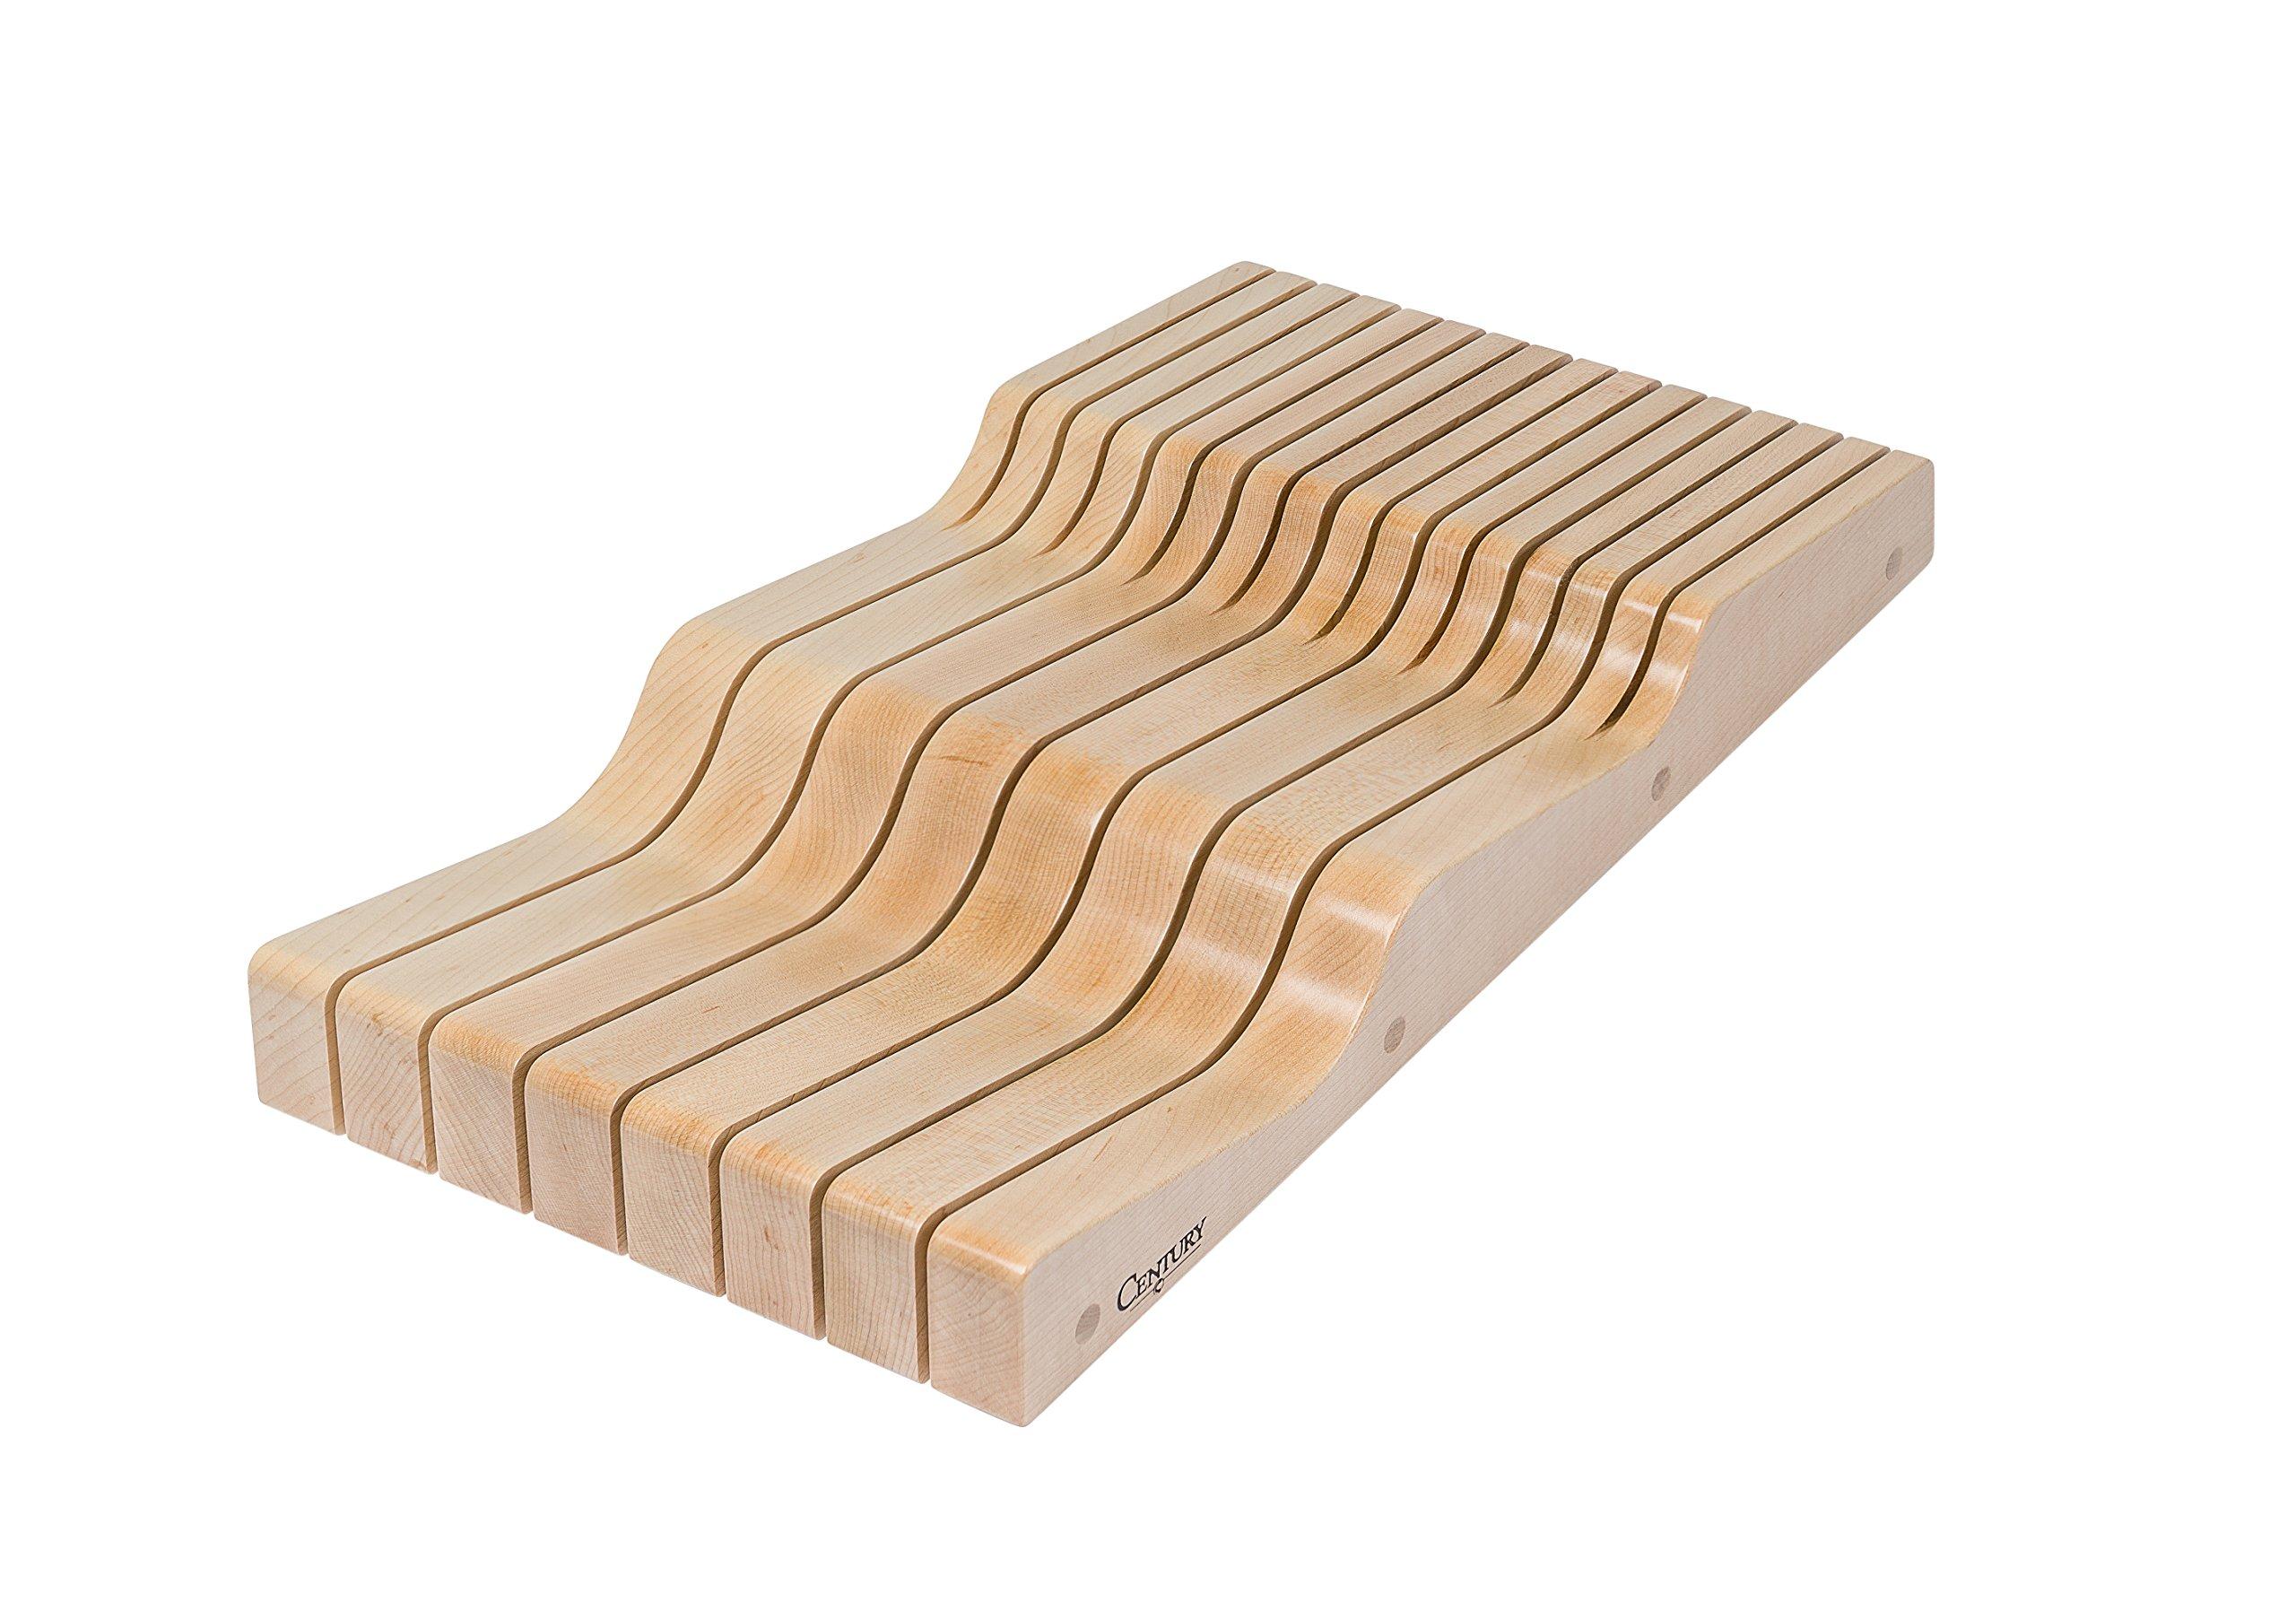 Century Components WKB90PF Wood Knife Block Tray Wave - 15 Knife Slots